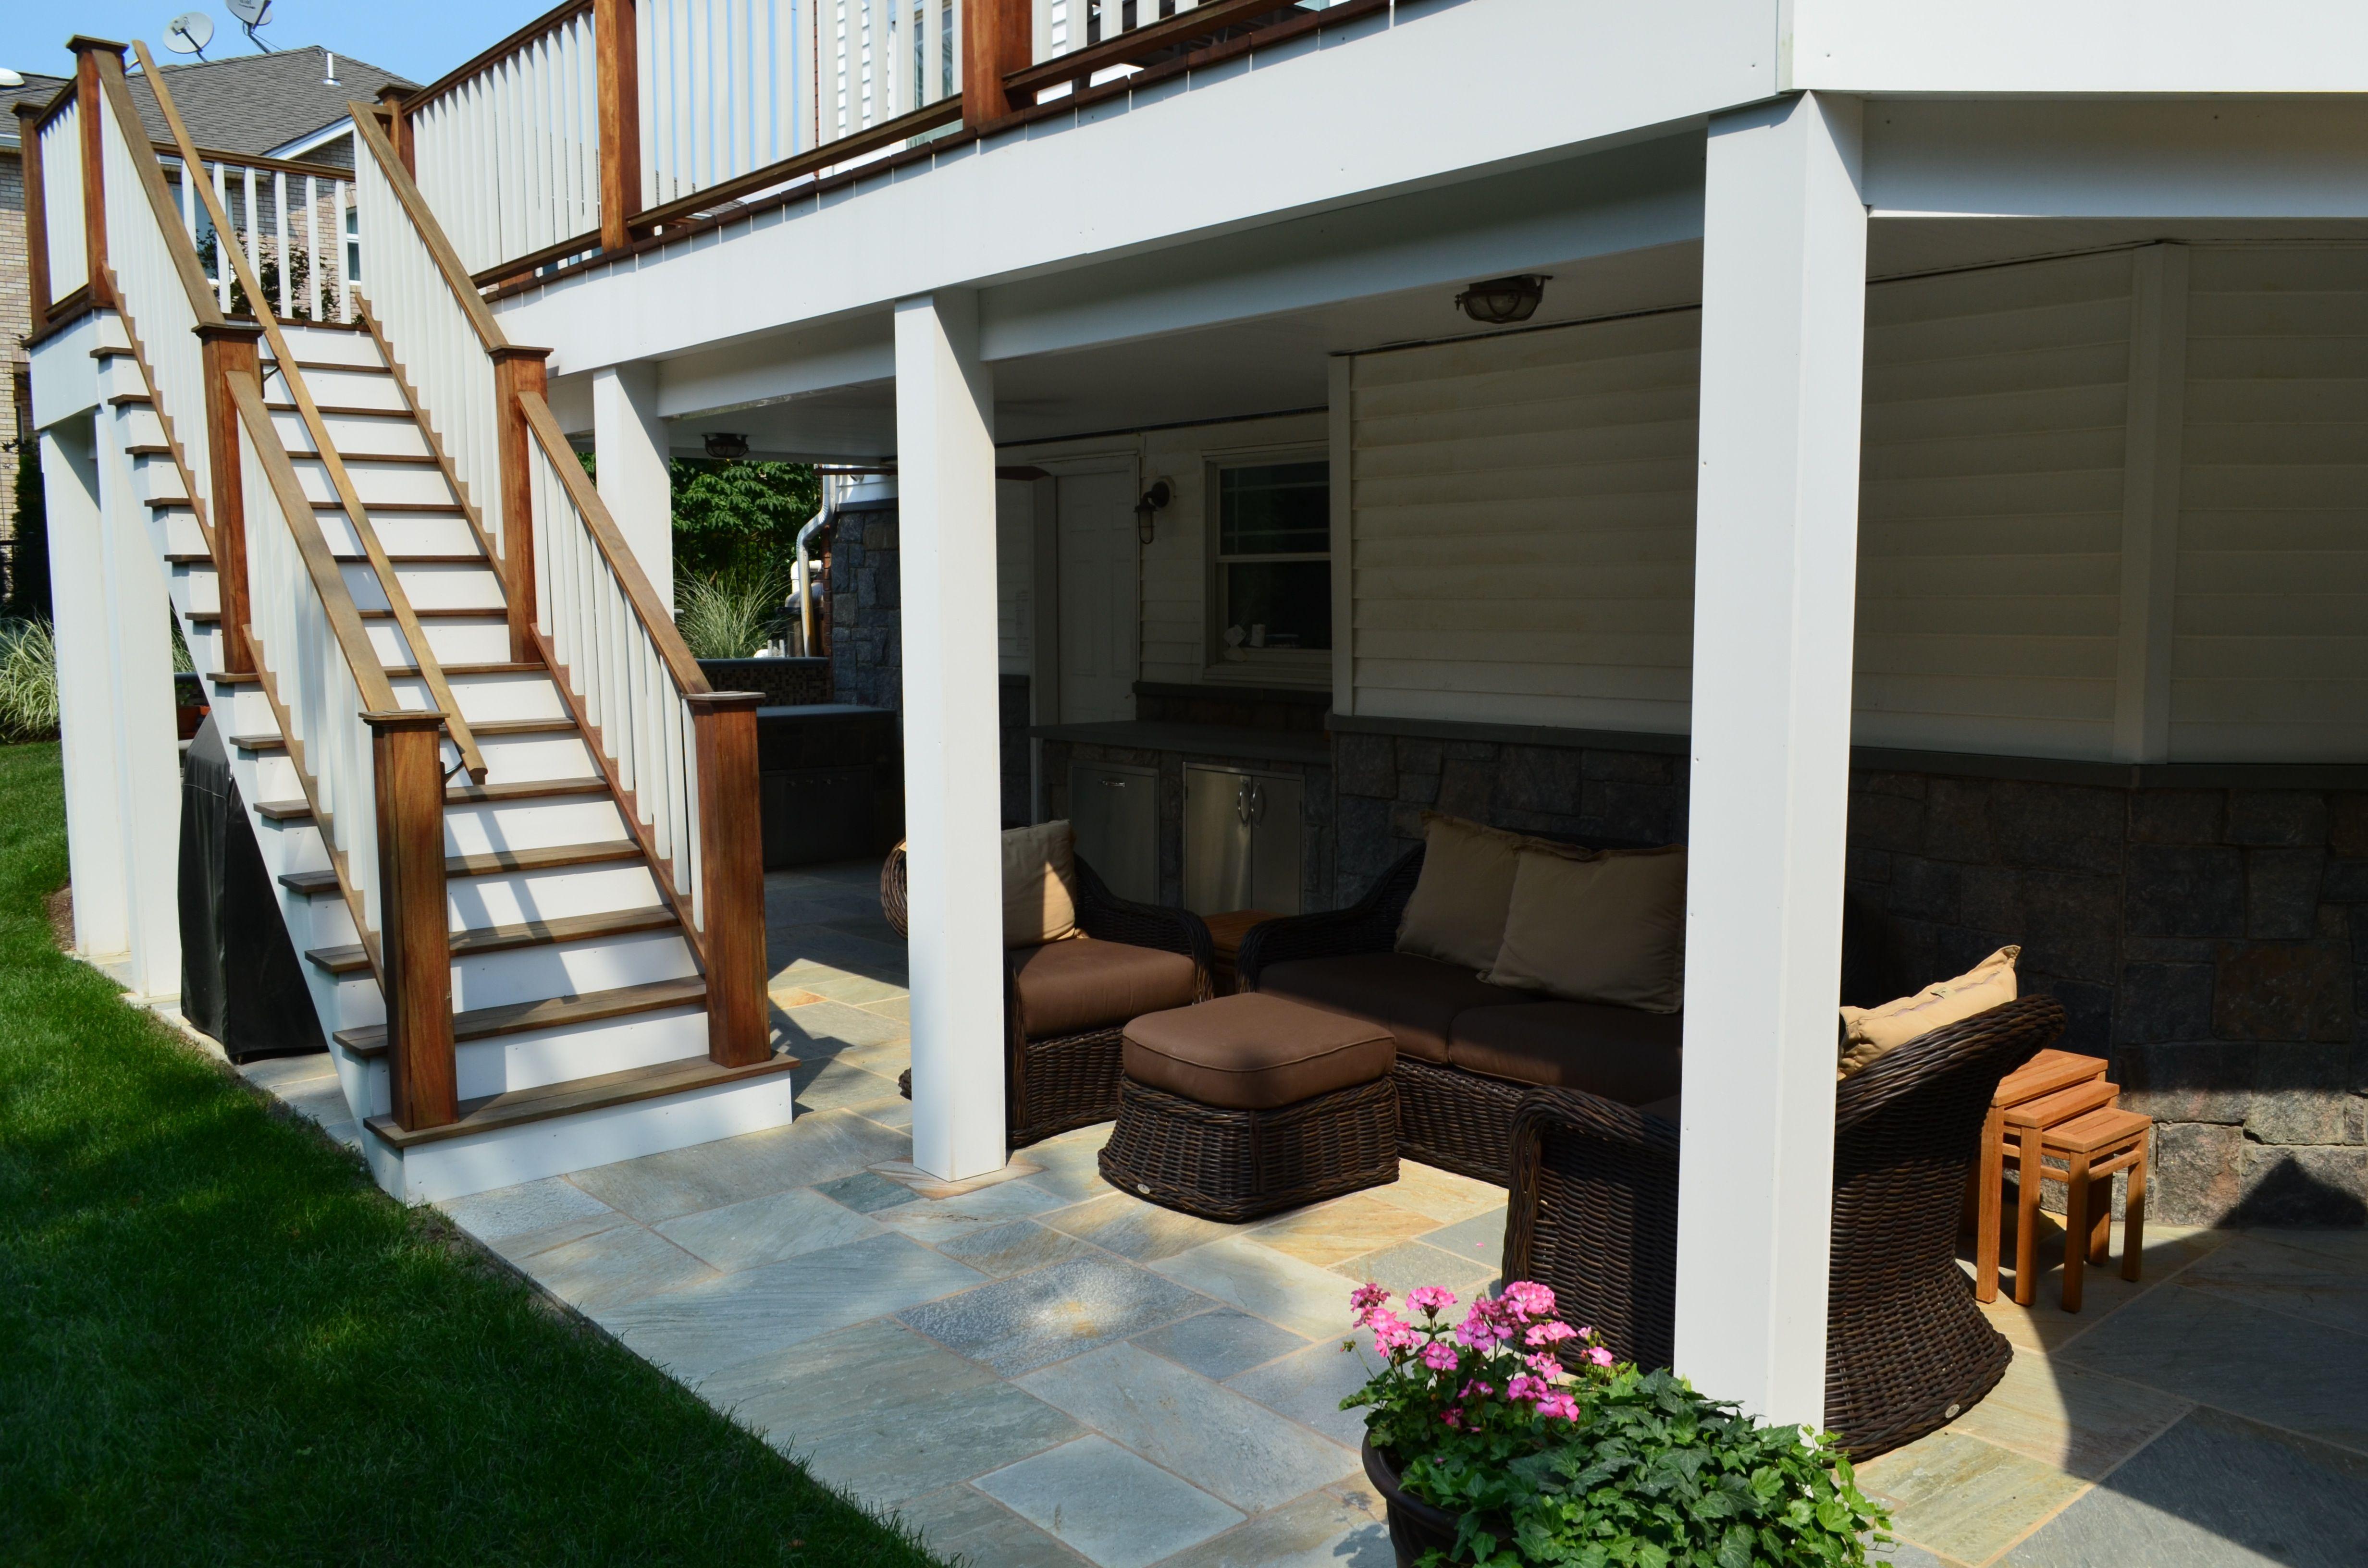 2013 Best Custom Swimming Pools Cipriano Landscape Design Nj Walkout Basement Patio Patio Under Decks Contemporary Patio